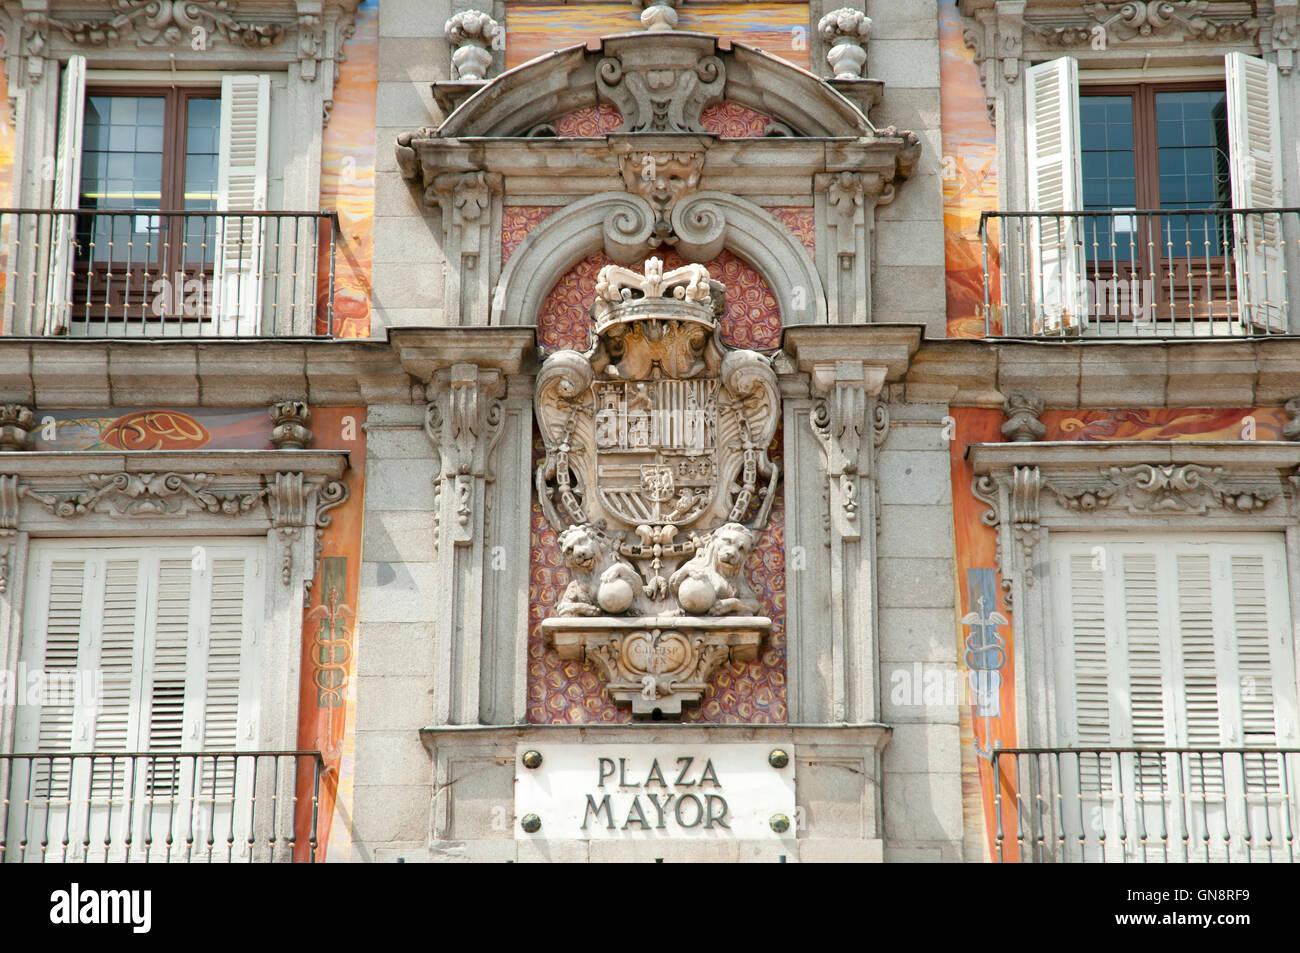 Coat Of Arms Of Spain Stockfotos U0026 Coat Of Arms Of Spain Bilder   Alamy